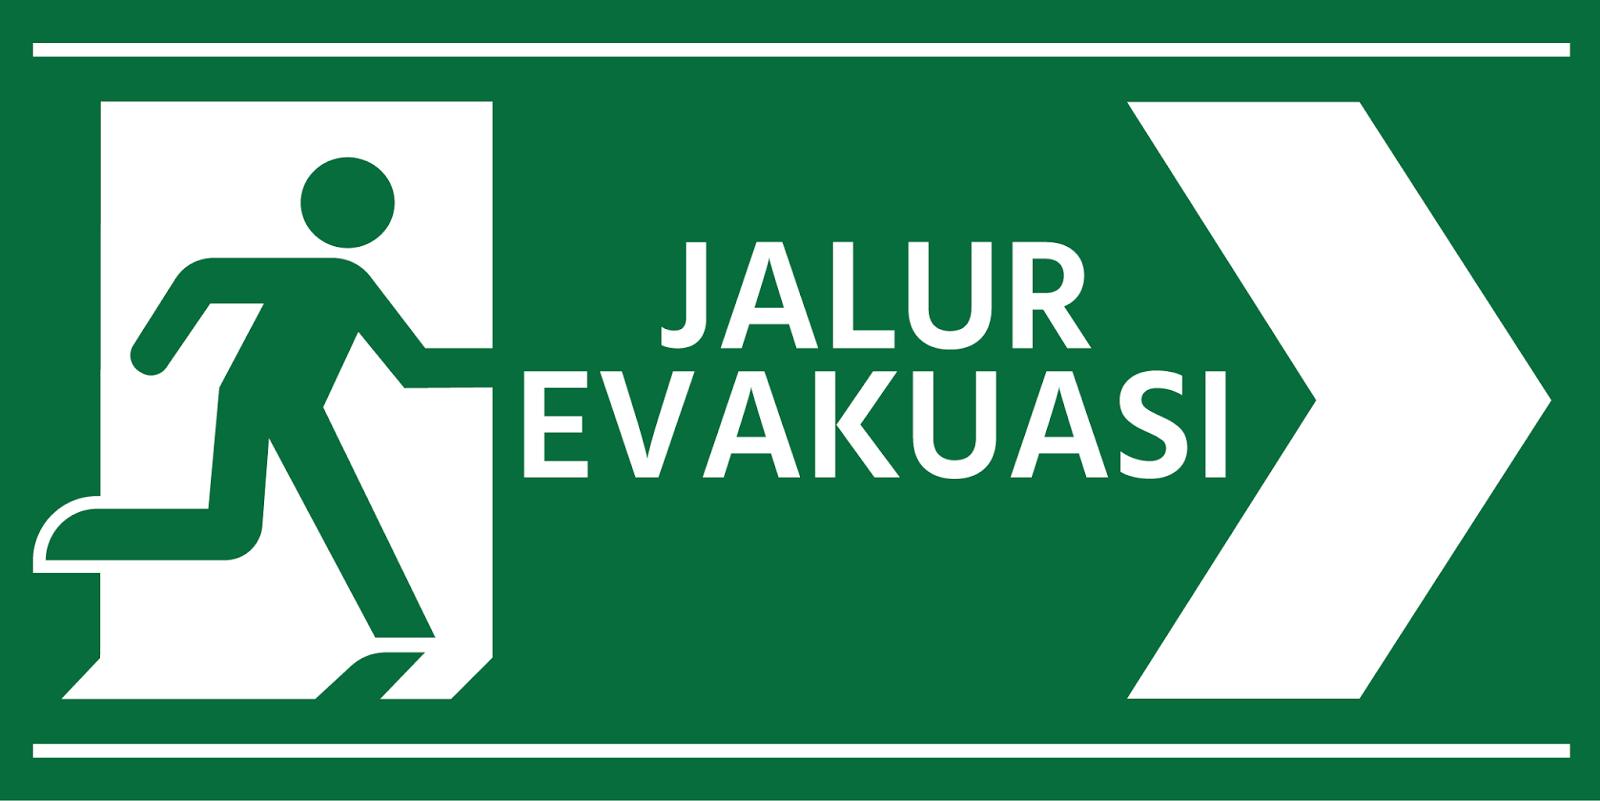 Pengertian Dan Penerapan Jalur Evakuasi Rian Jaya Safety Perlengkapan Alat Safety Jakarta